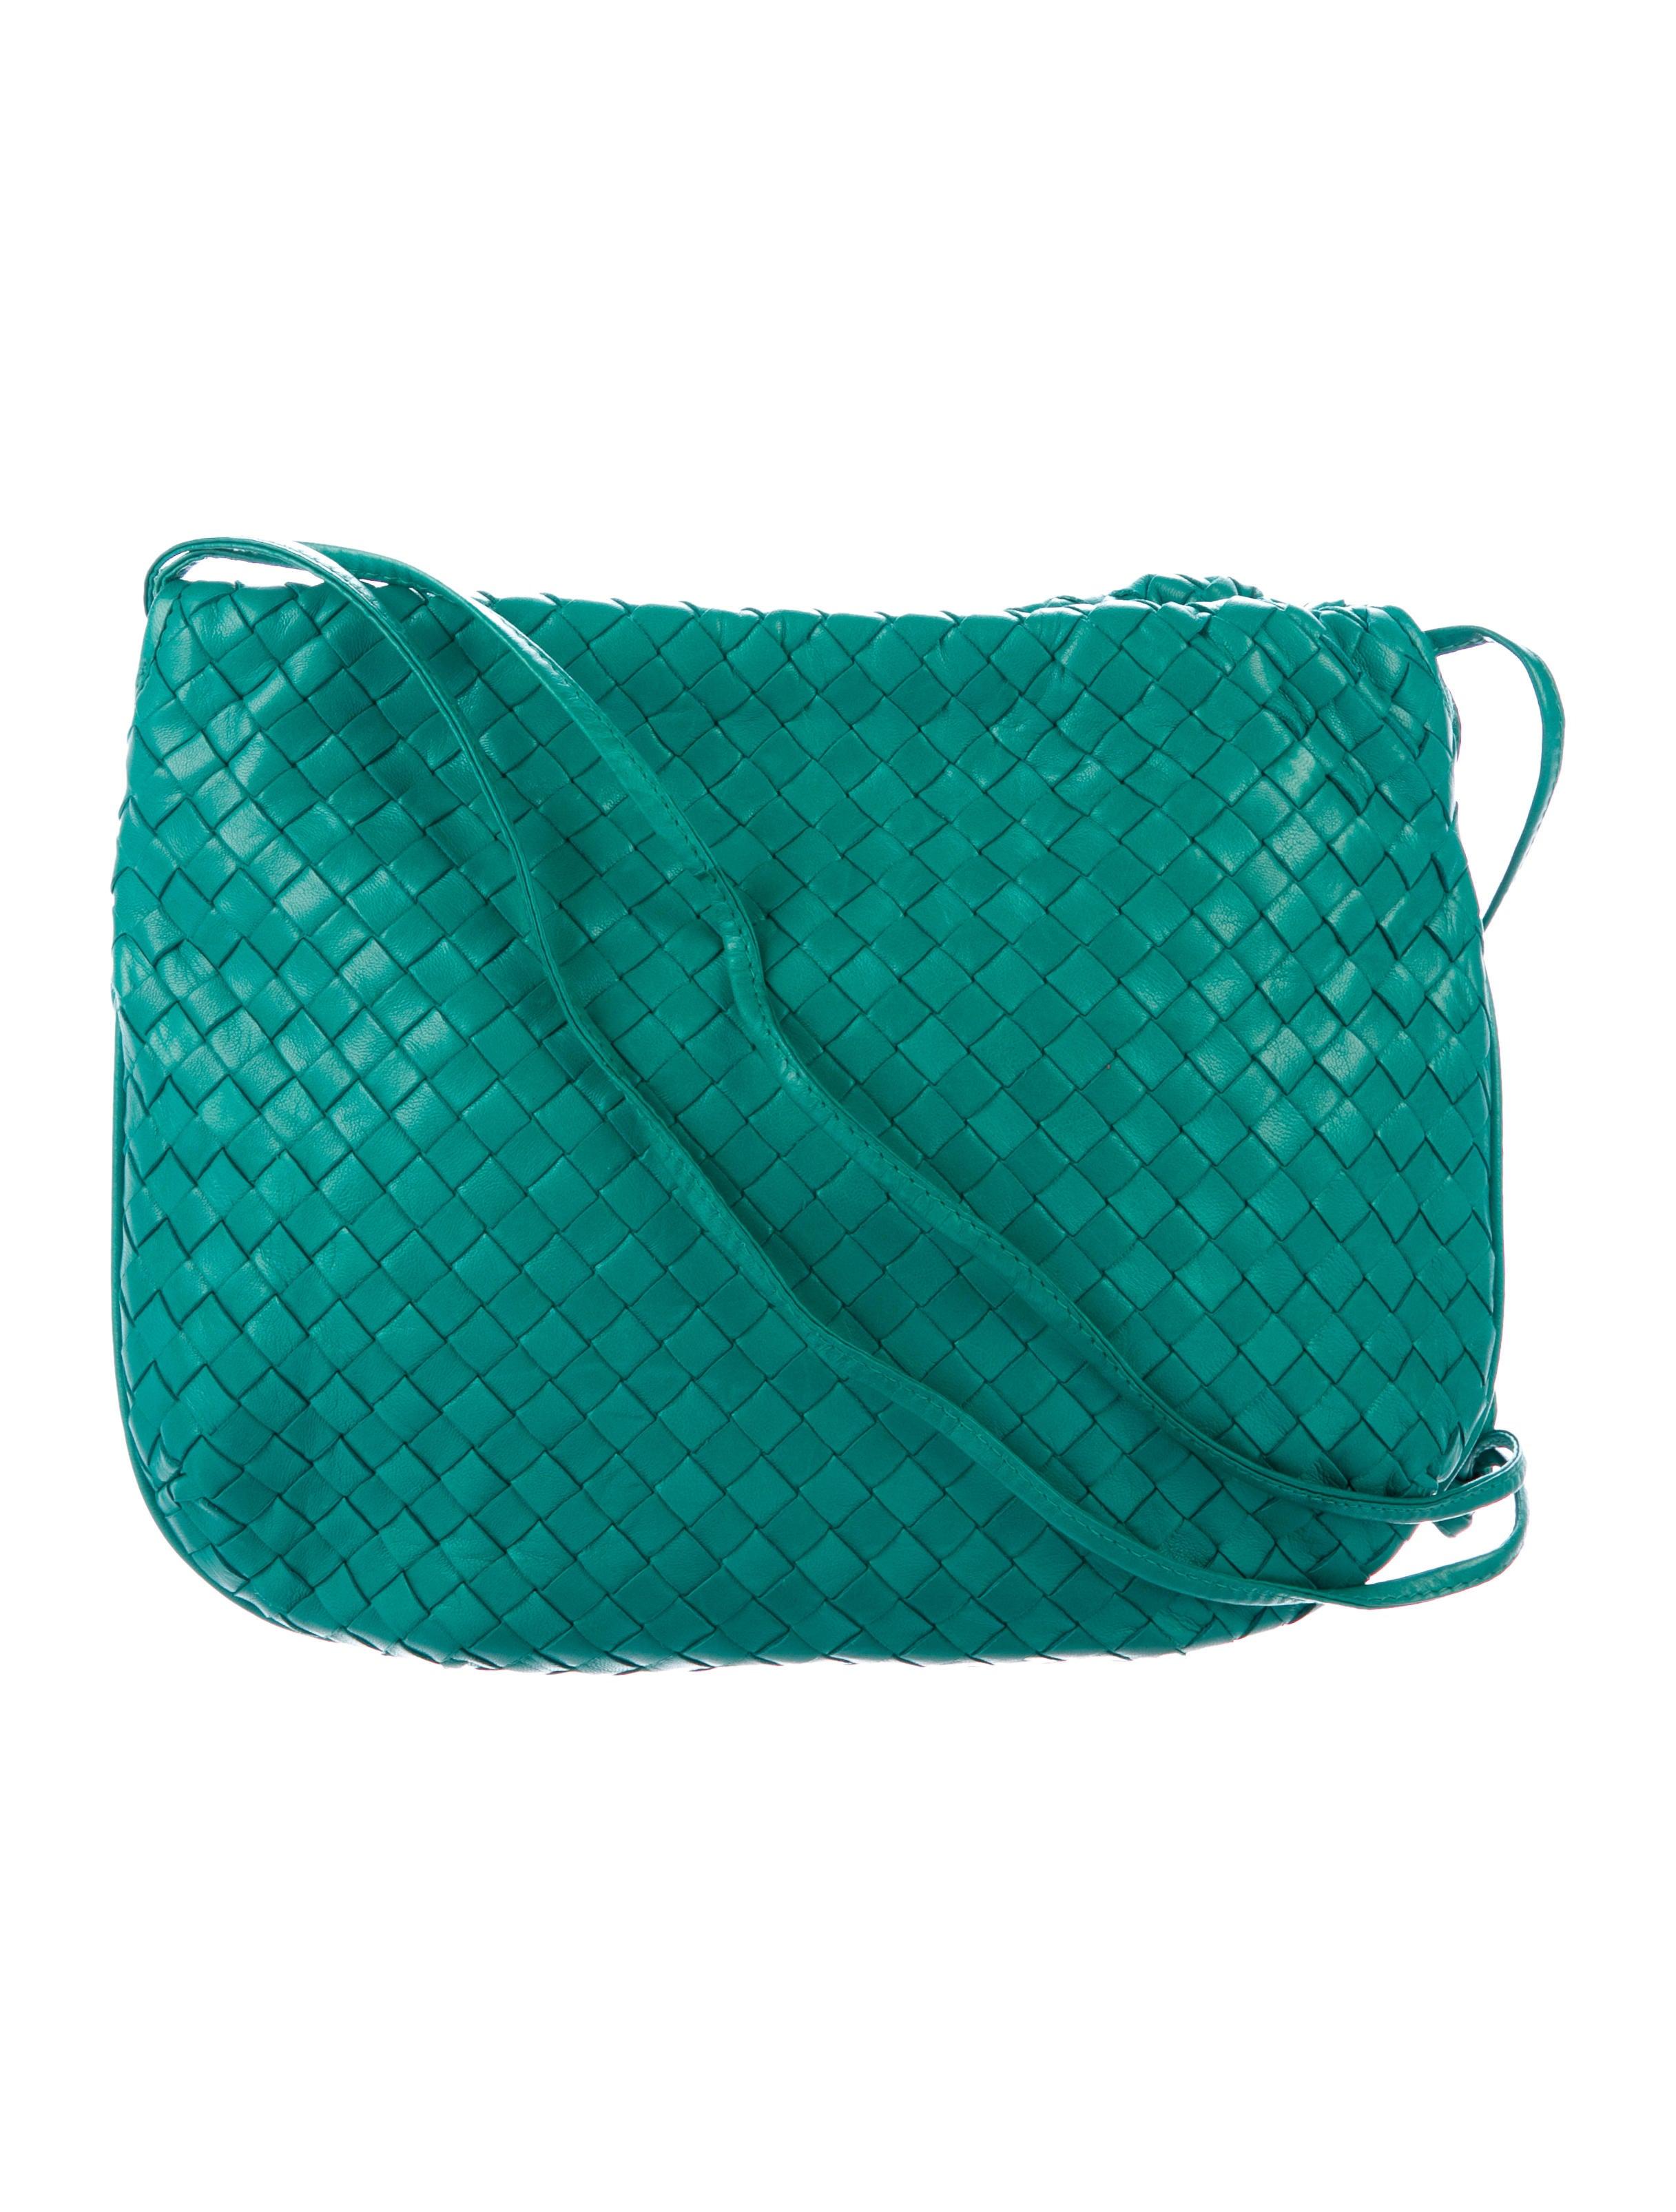 Bottega Veneta Intrecciato Veneta Drawstring Bottega Intrecciato Drawstring  Bag Bag XqwSnrxXH ... f3fb22ec2d9fc